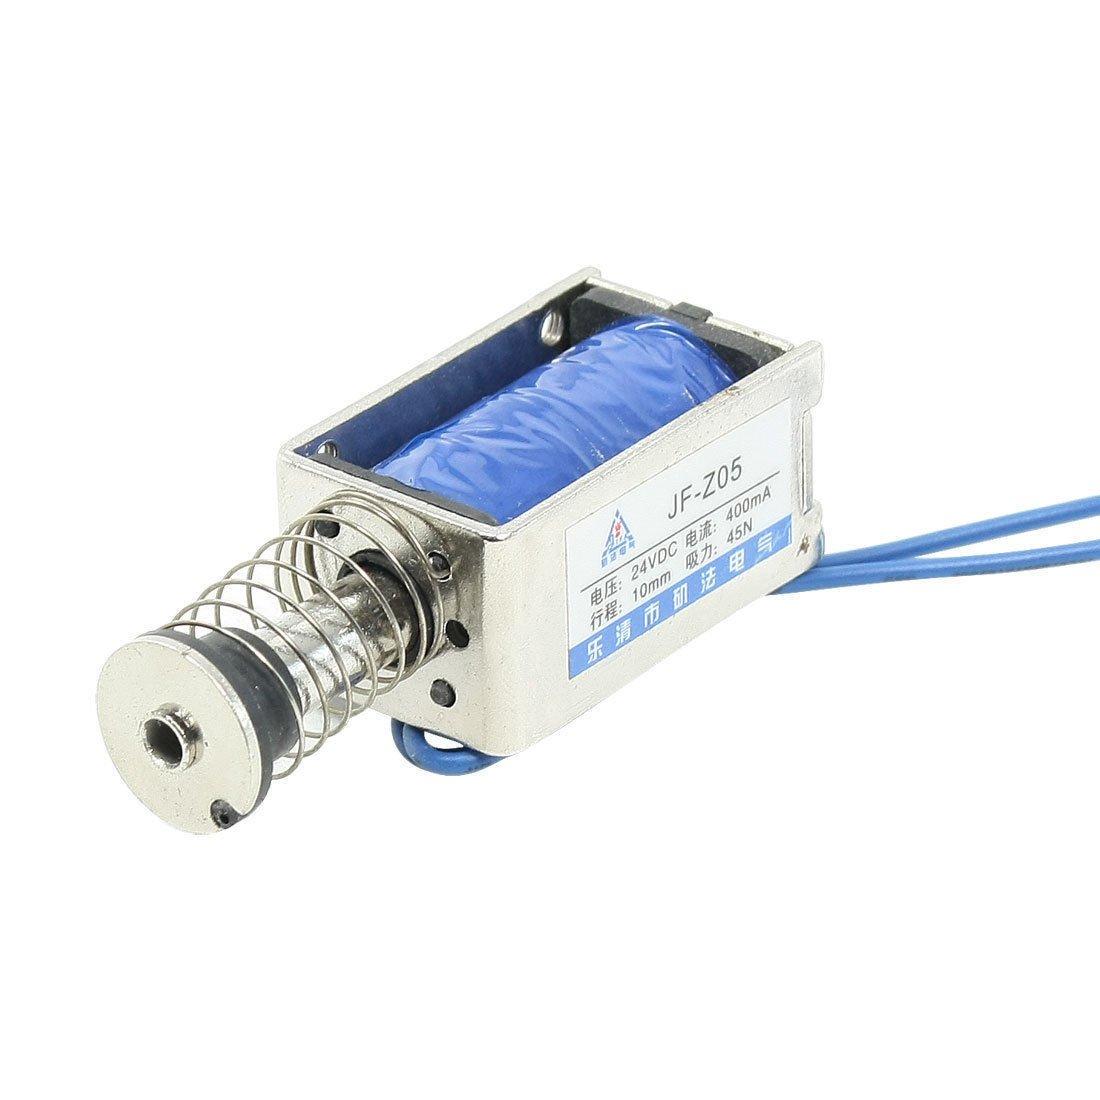 DC 24V 10mm 4.5Kg 9.9lb Push Pull Type Open Frame Solenoid Electromagnet JF-Z05